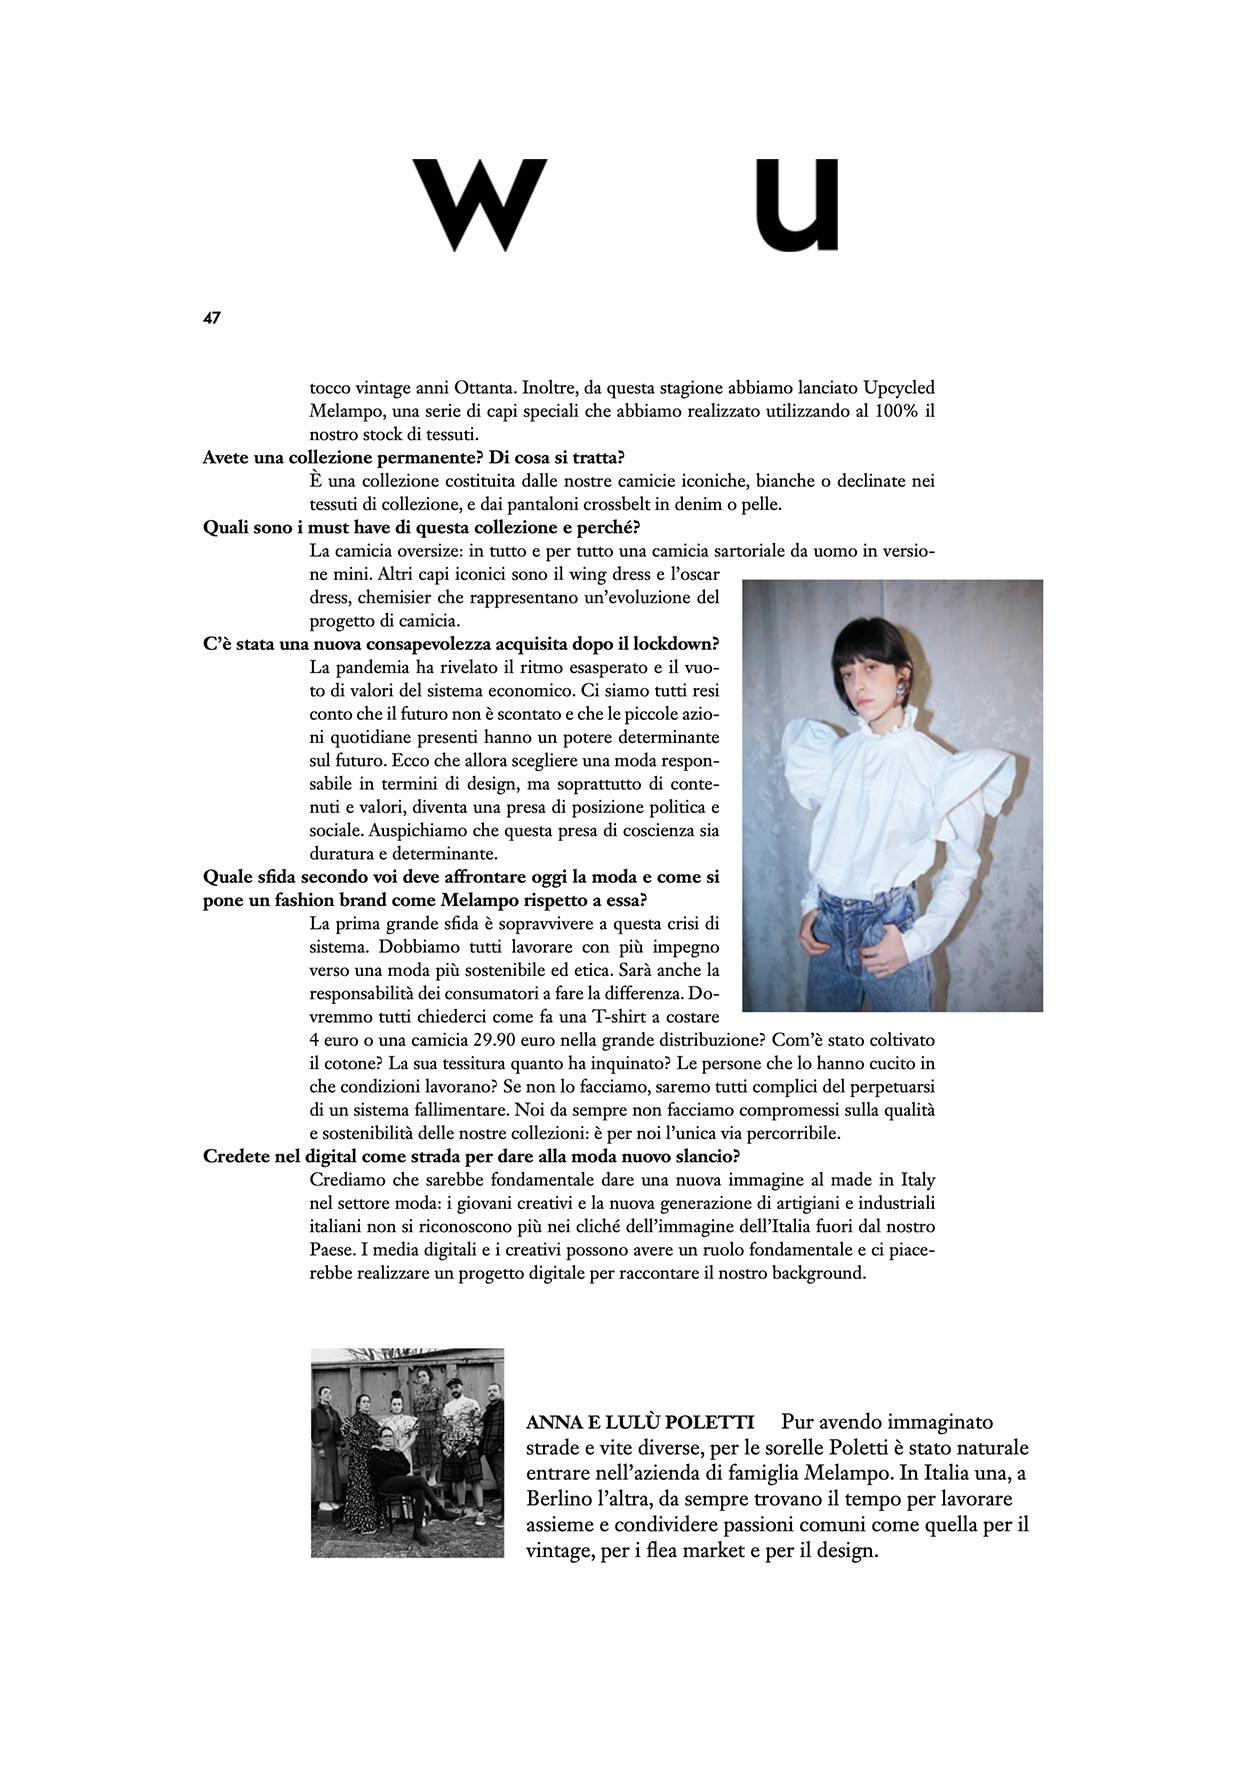 melampo interview on wu magazine - photo 2